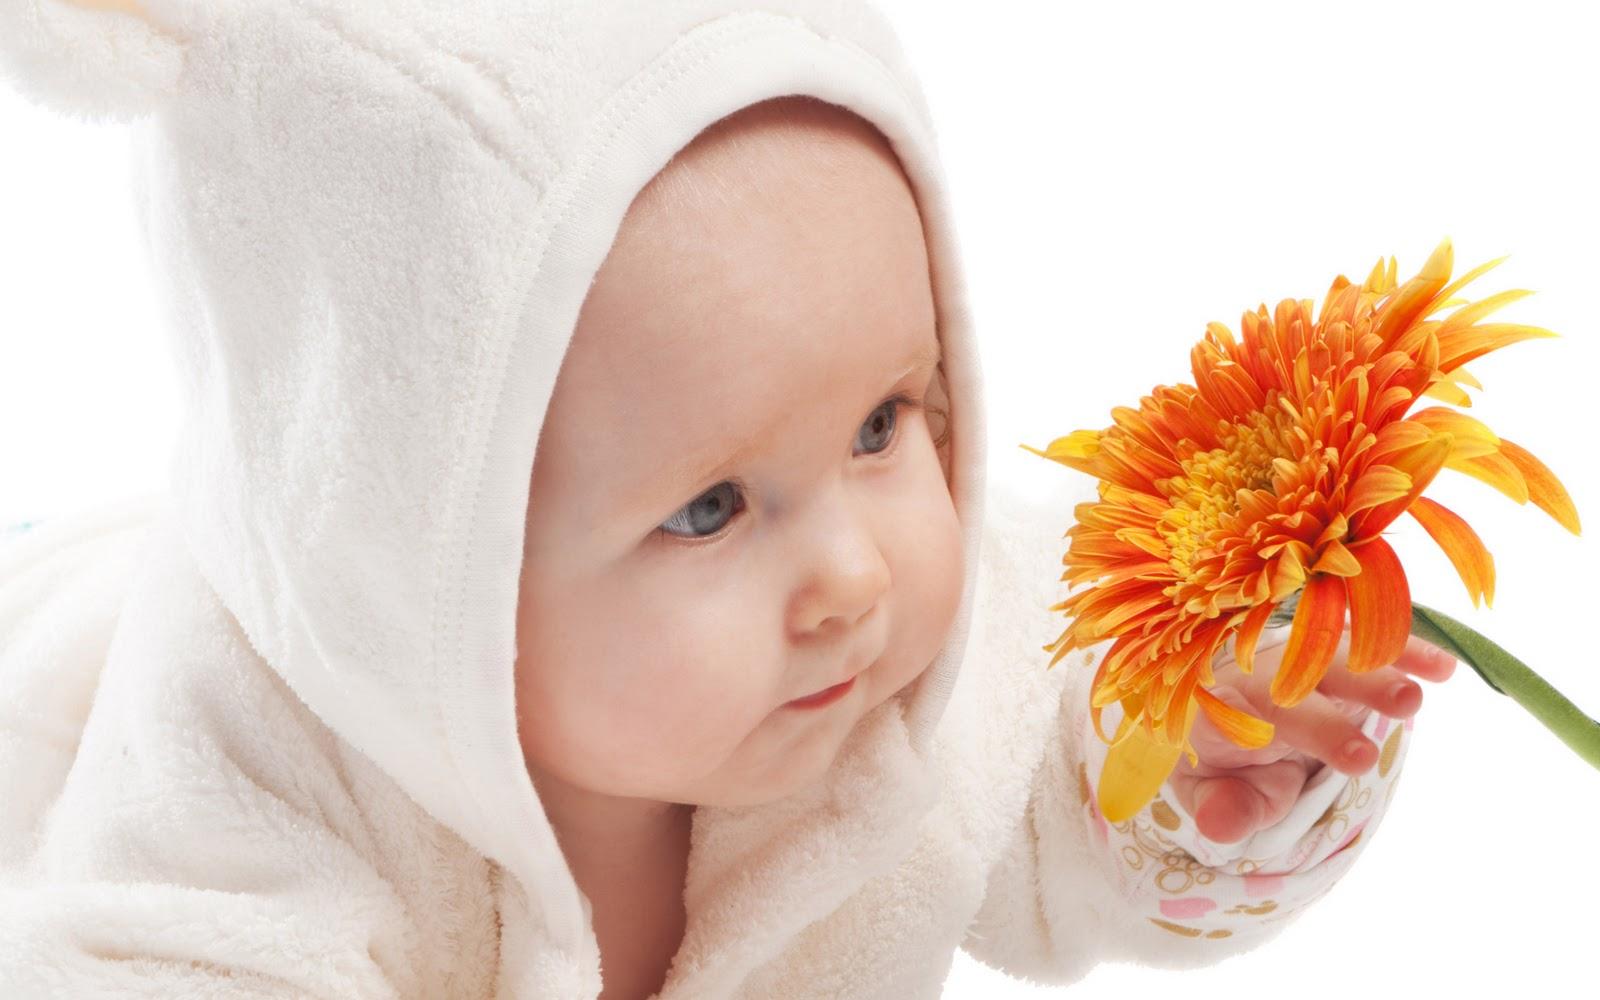 http://1.bp.blogspot.com/--RBwALtnwFs/TrjtT20rRzI/AAAAAAAAMdY/AYF21rX4fcg/s1600/Cute--Baby--Wallpaper---010.jpg